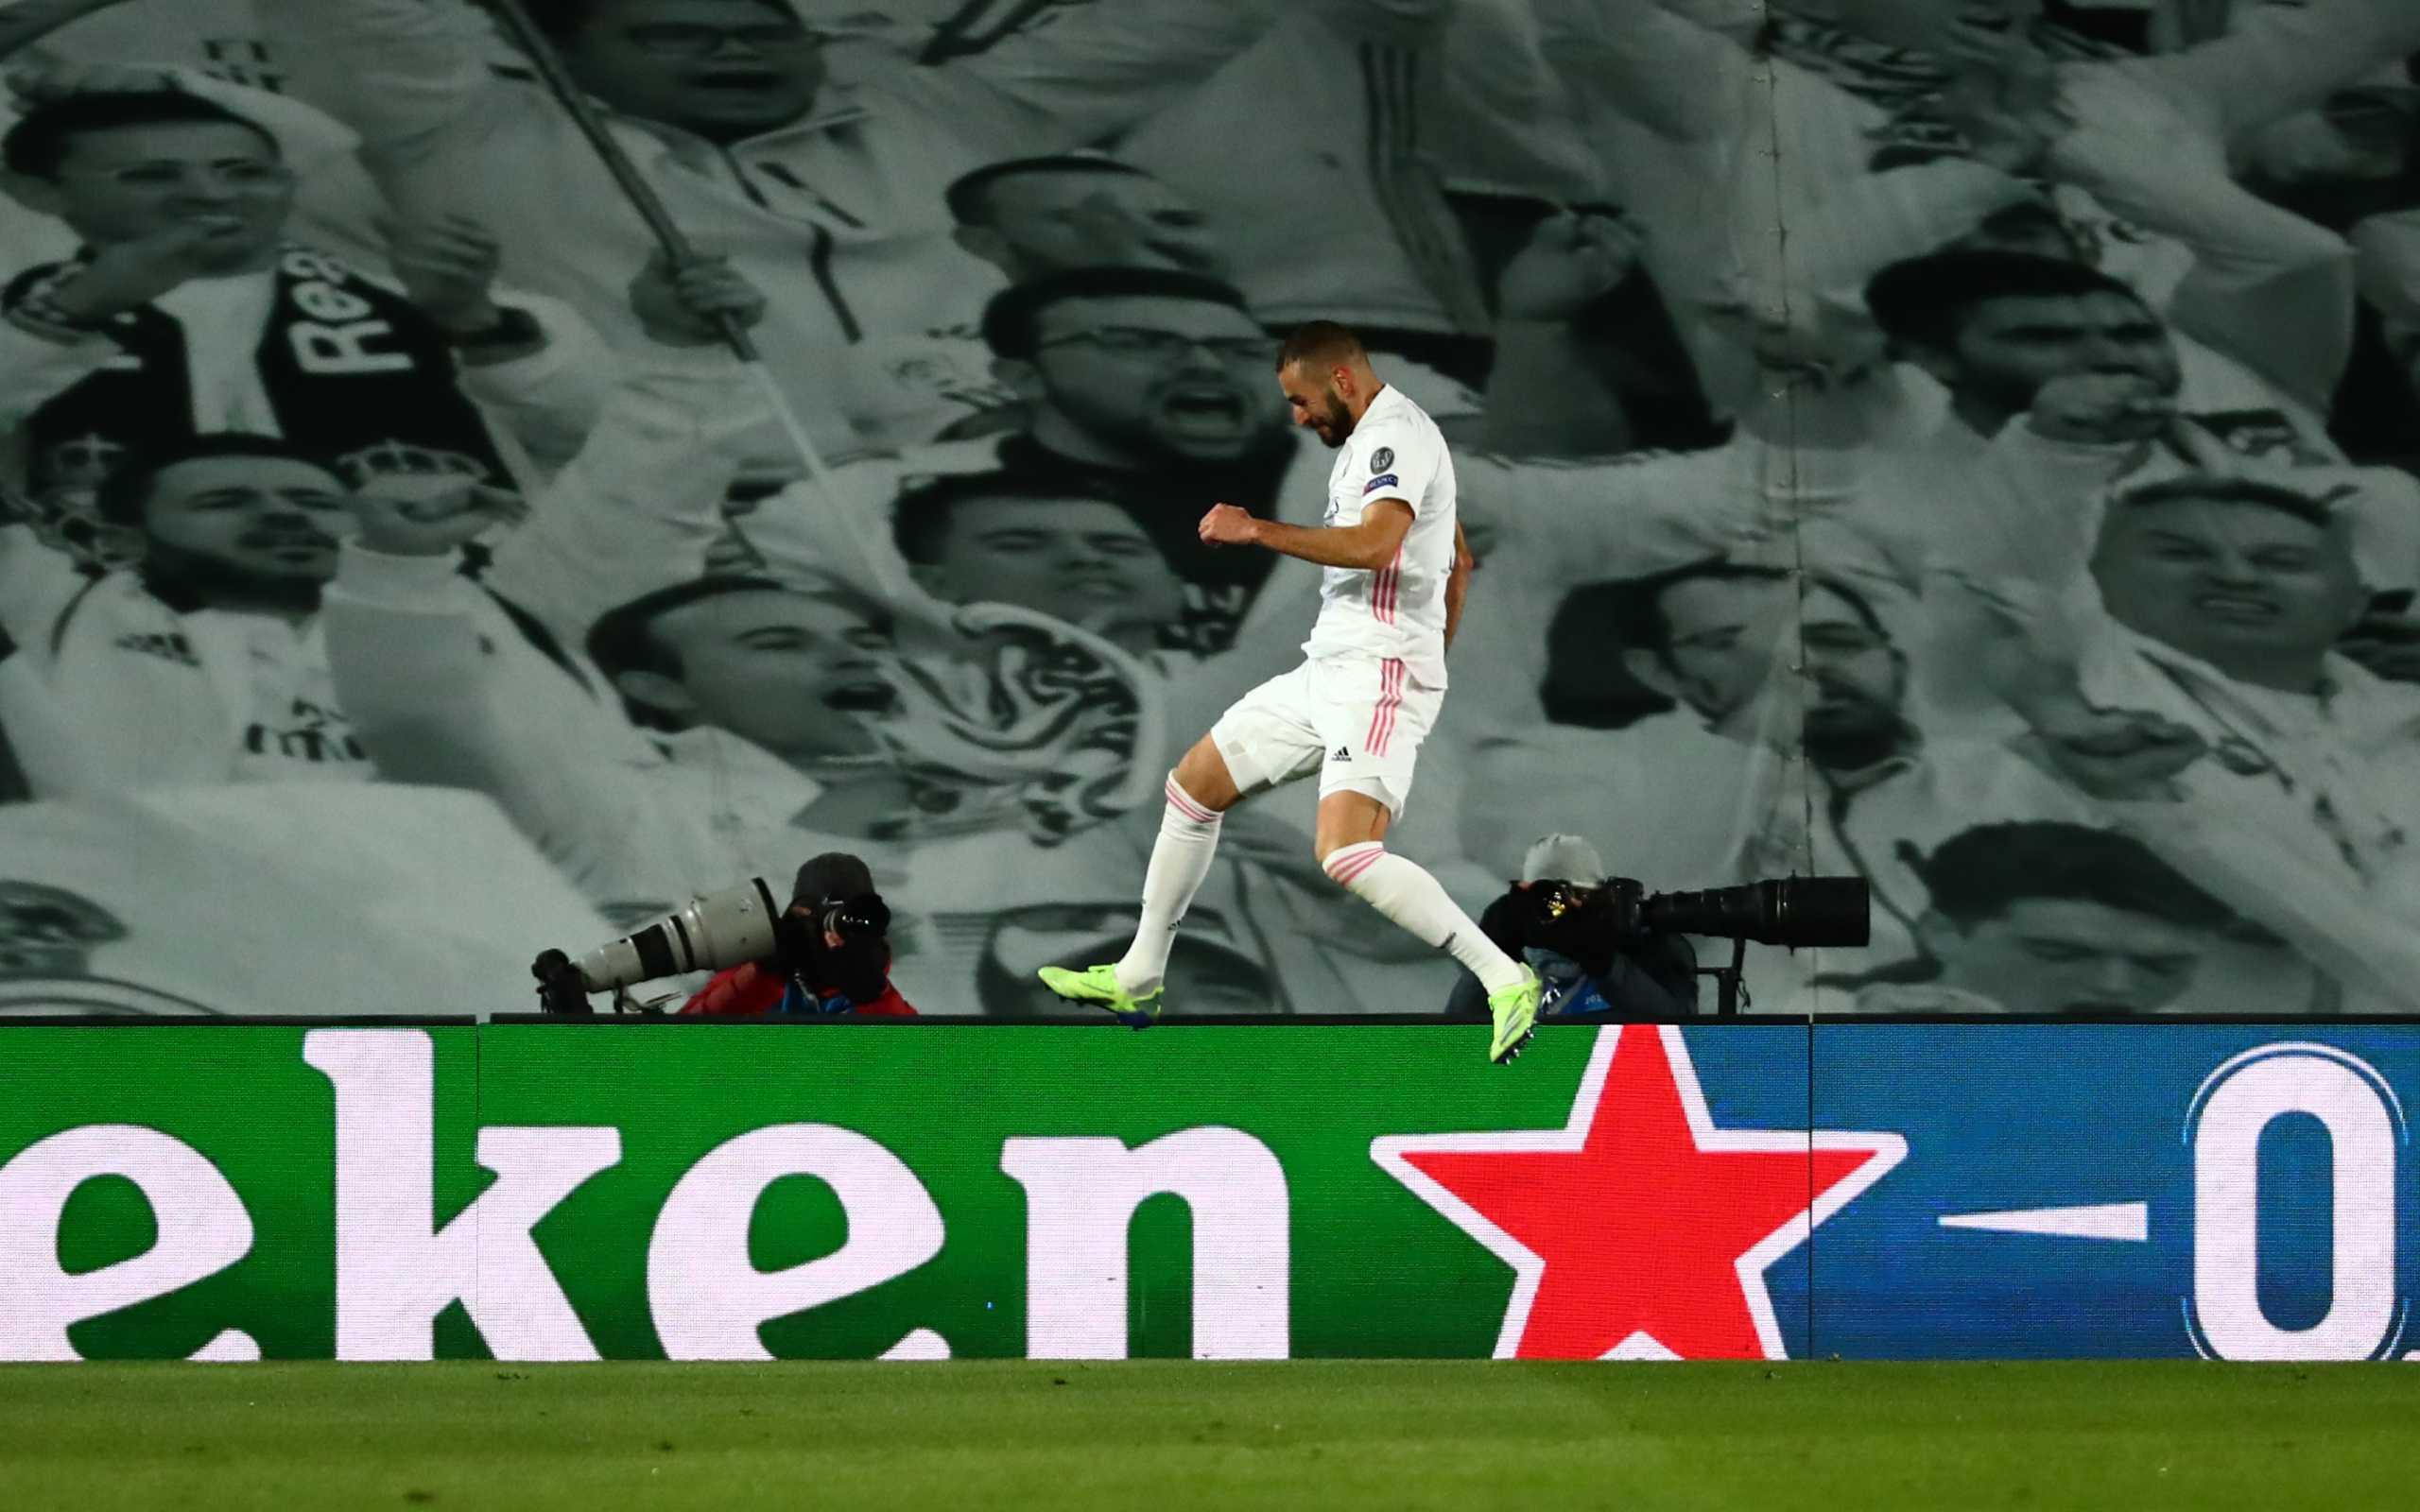 Champions League: Τέλος καλό… όλα καλά για την Ρεάλ! «Μαύρη» βραδιά για την Ίντερ (videos)